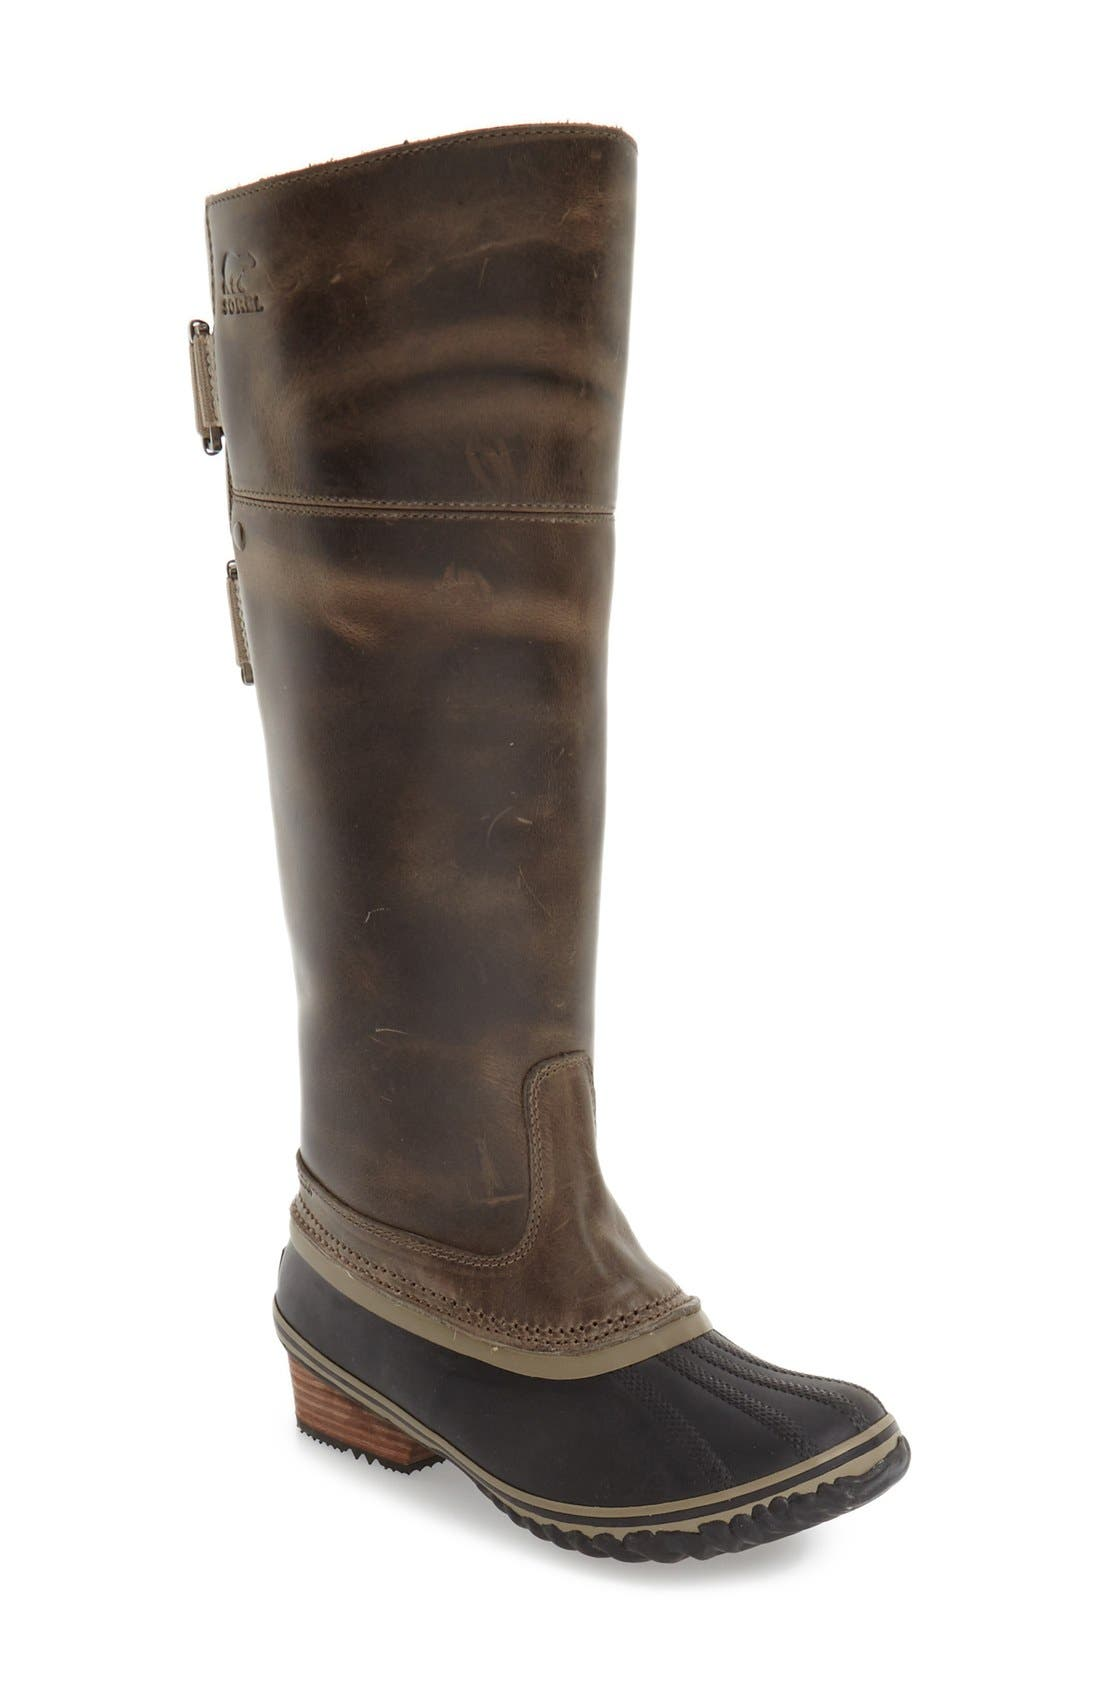 Main Image - SOREL 'Slimpack II' Waterproof Riding Boot (Women)